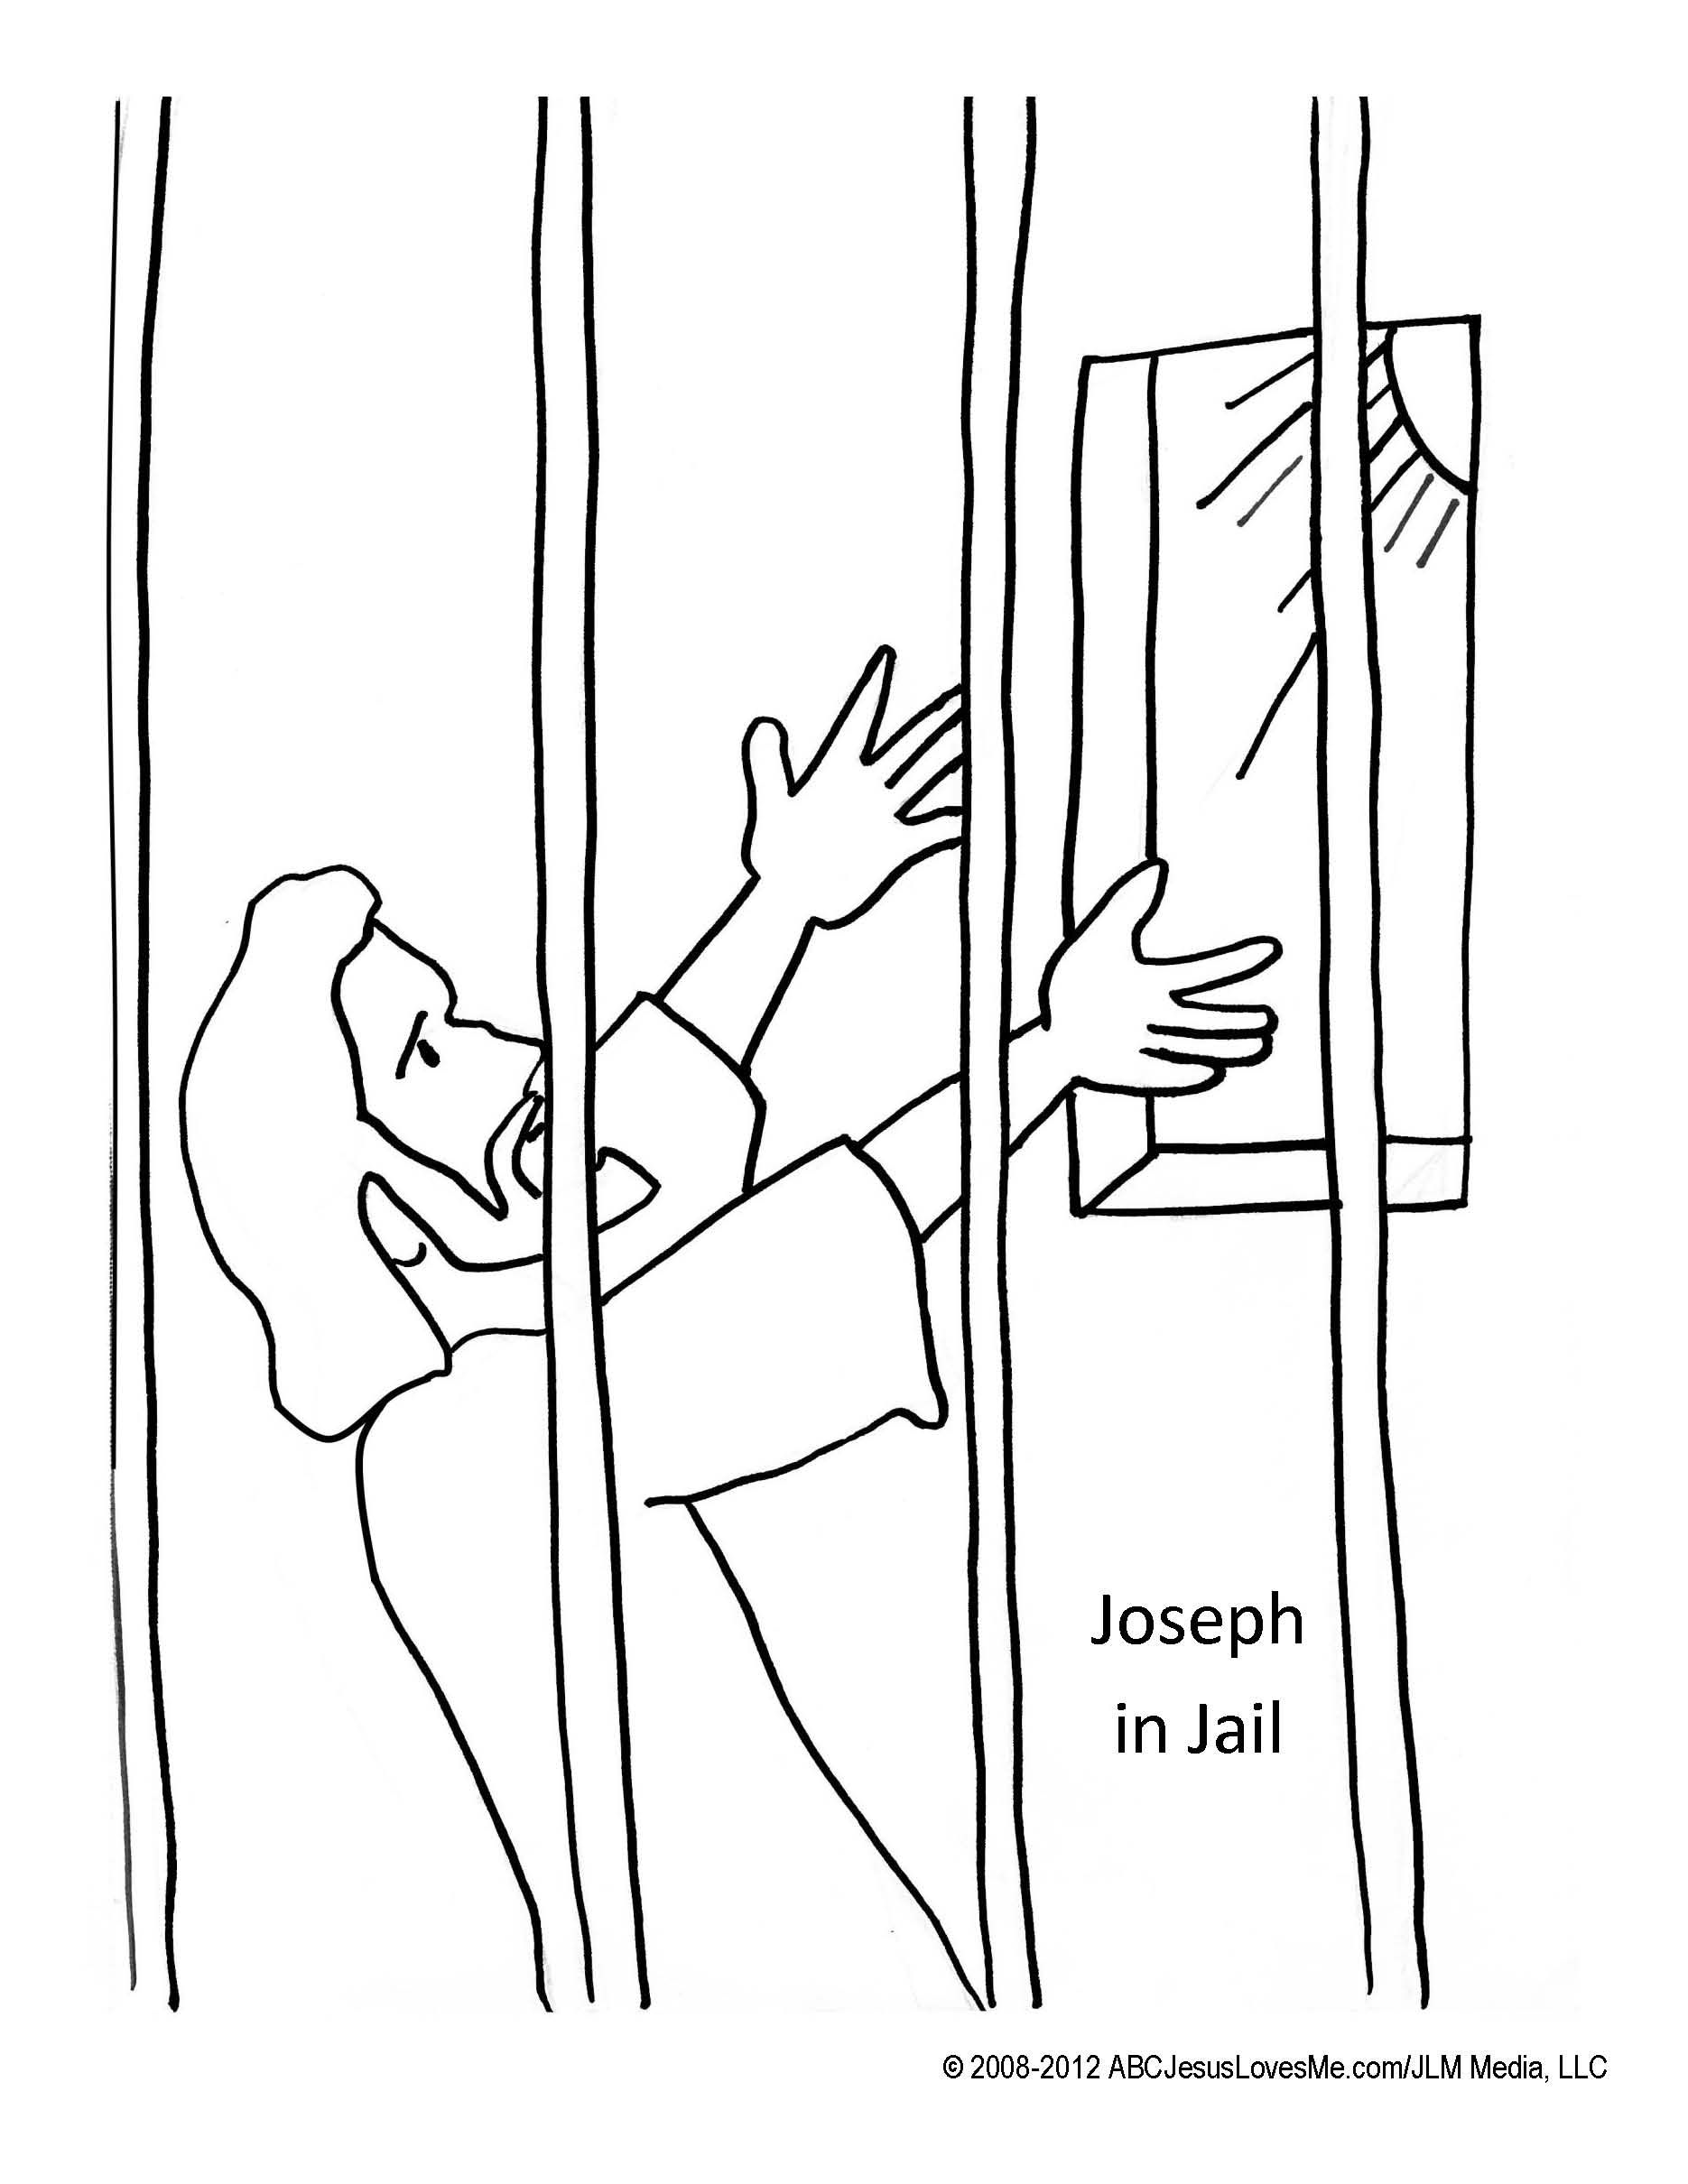 May 6-6 Joseph in Jail Glue paper onto bars..  School